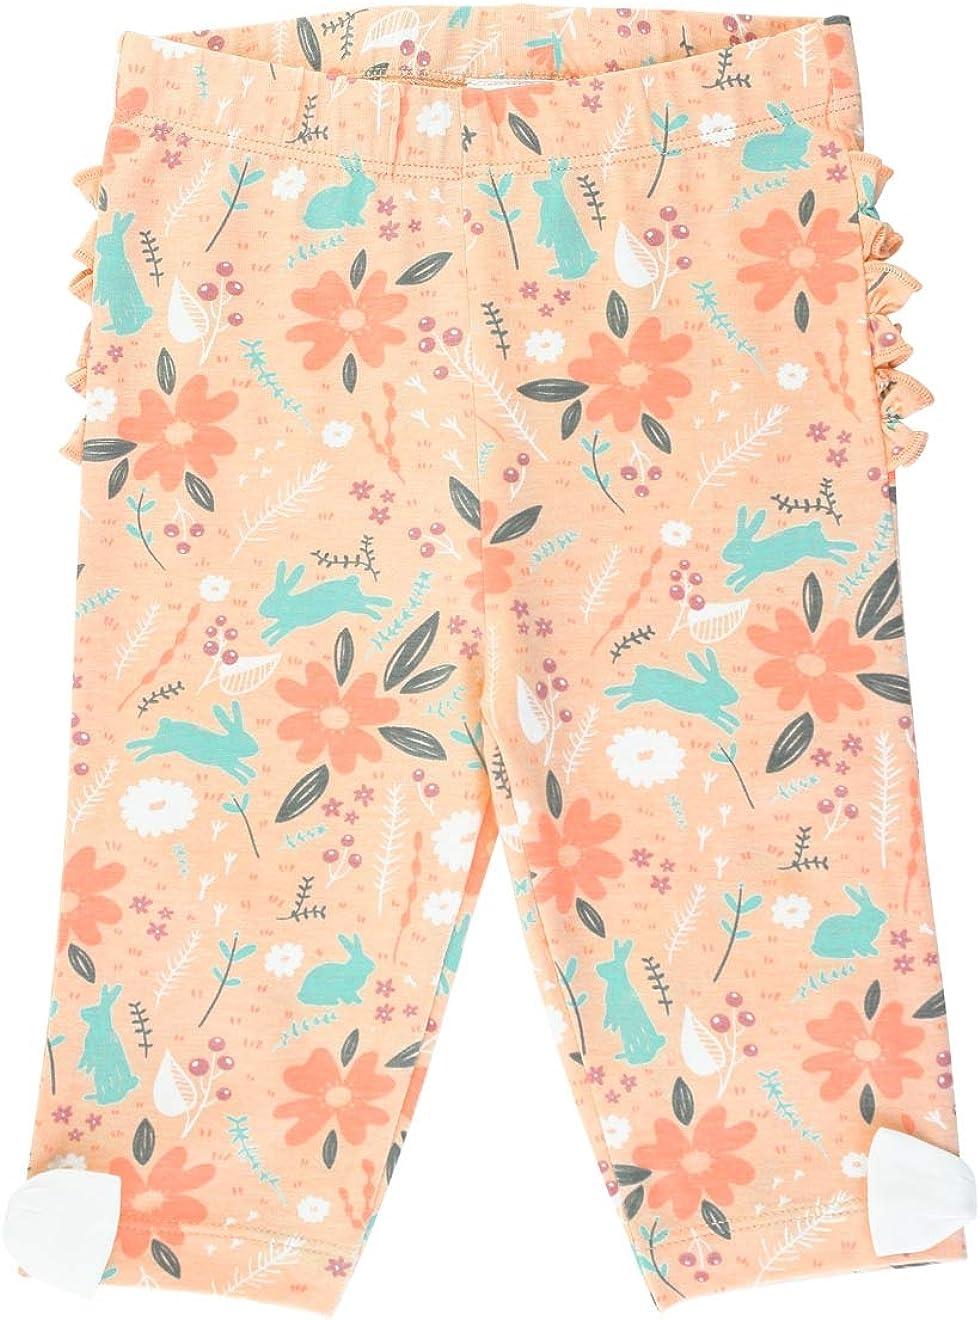 RuffleButts Baby//Toddler Girls Stretchy Capri Leggings with Bow